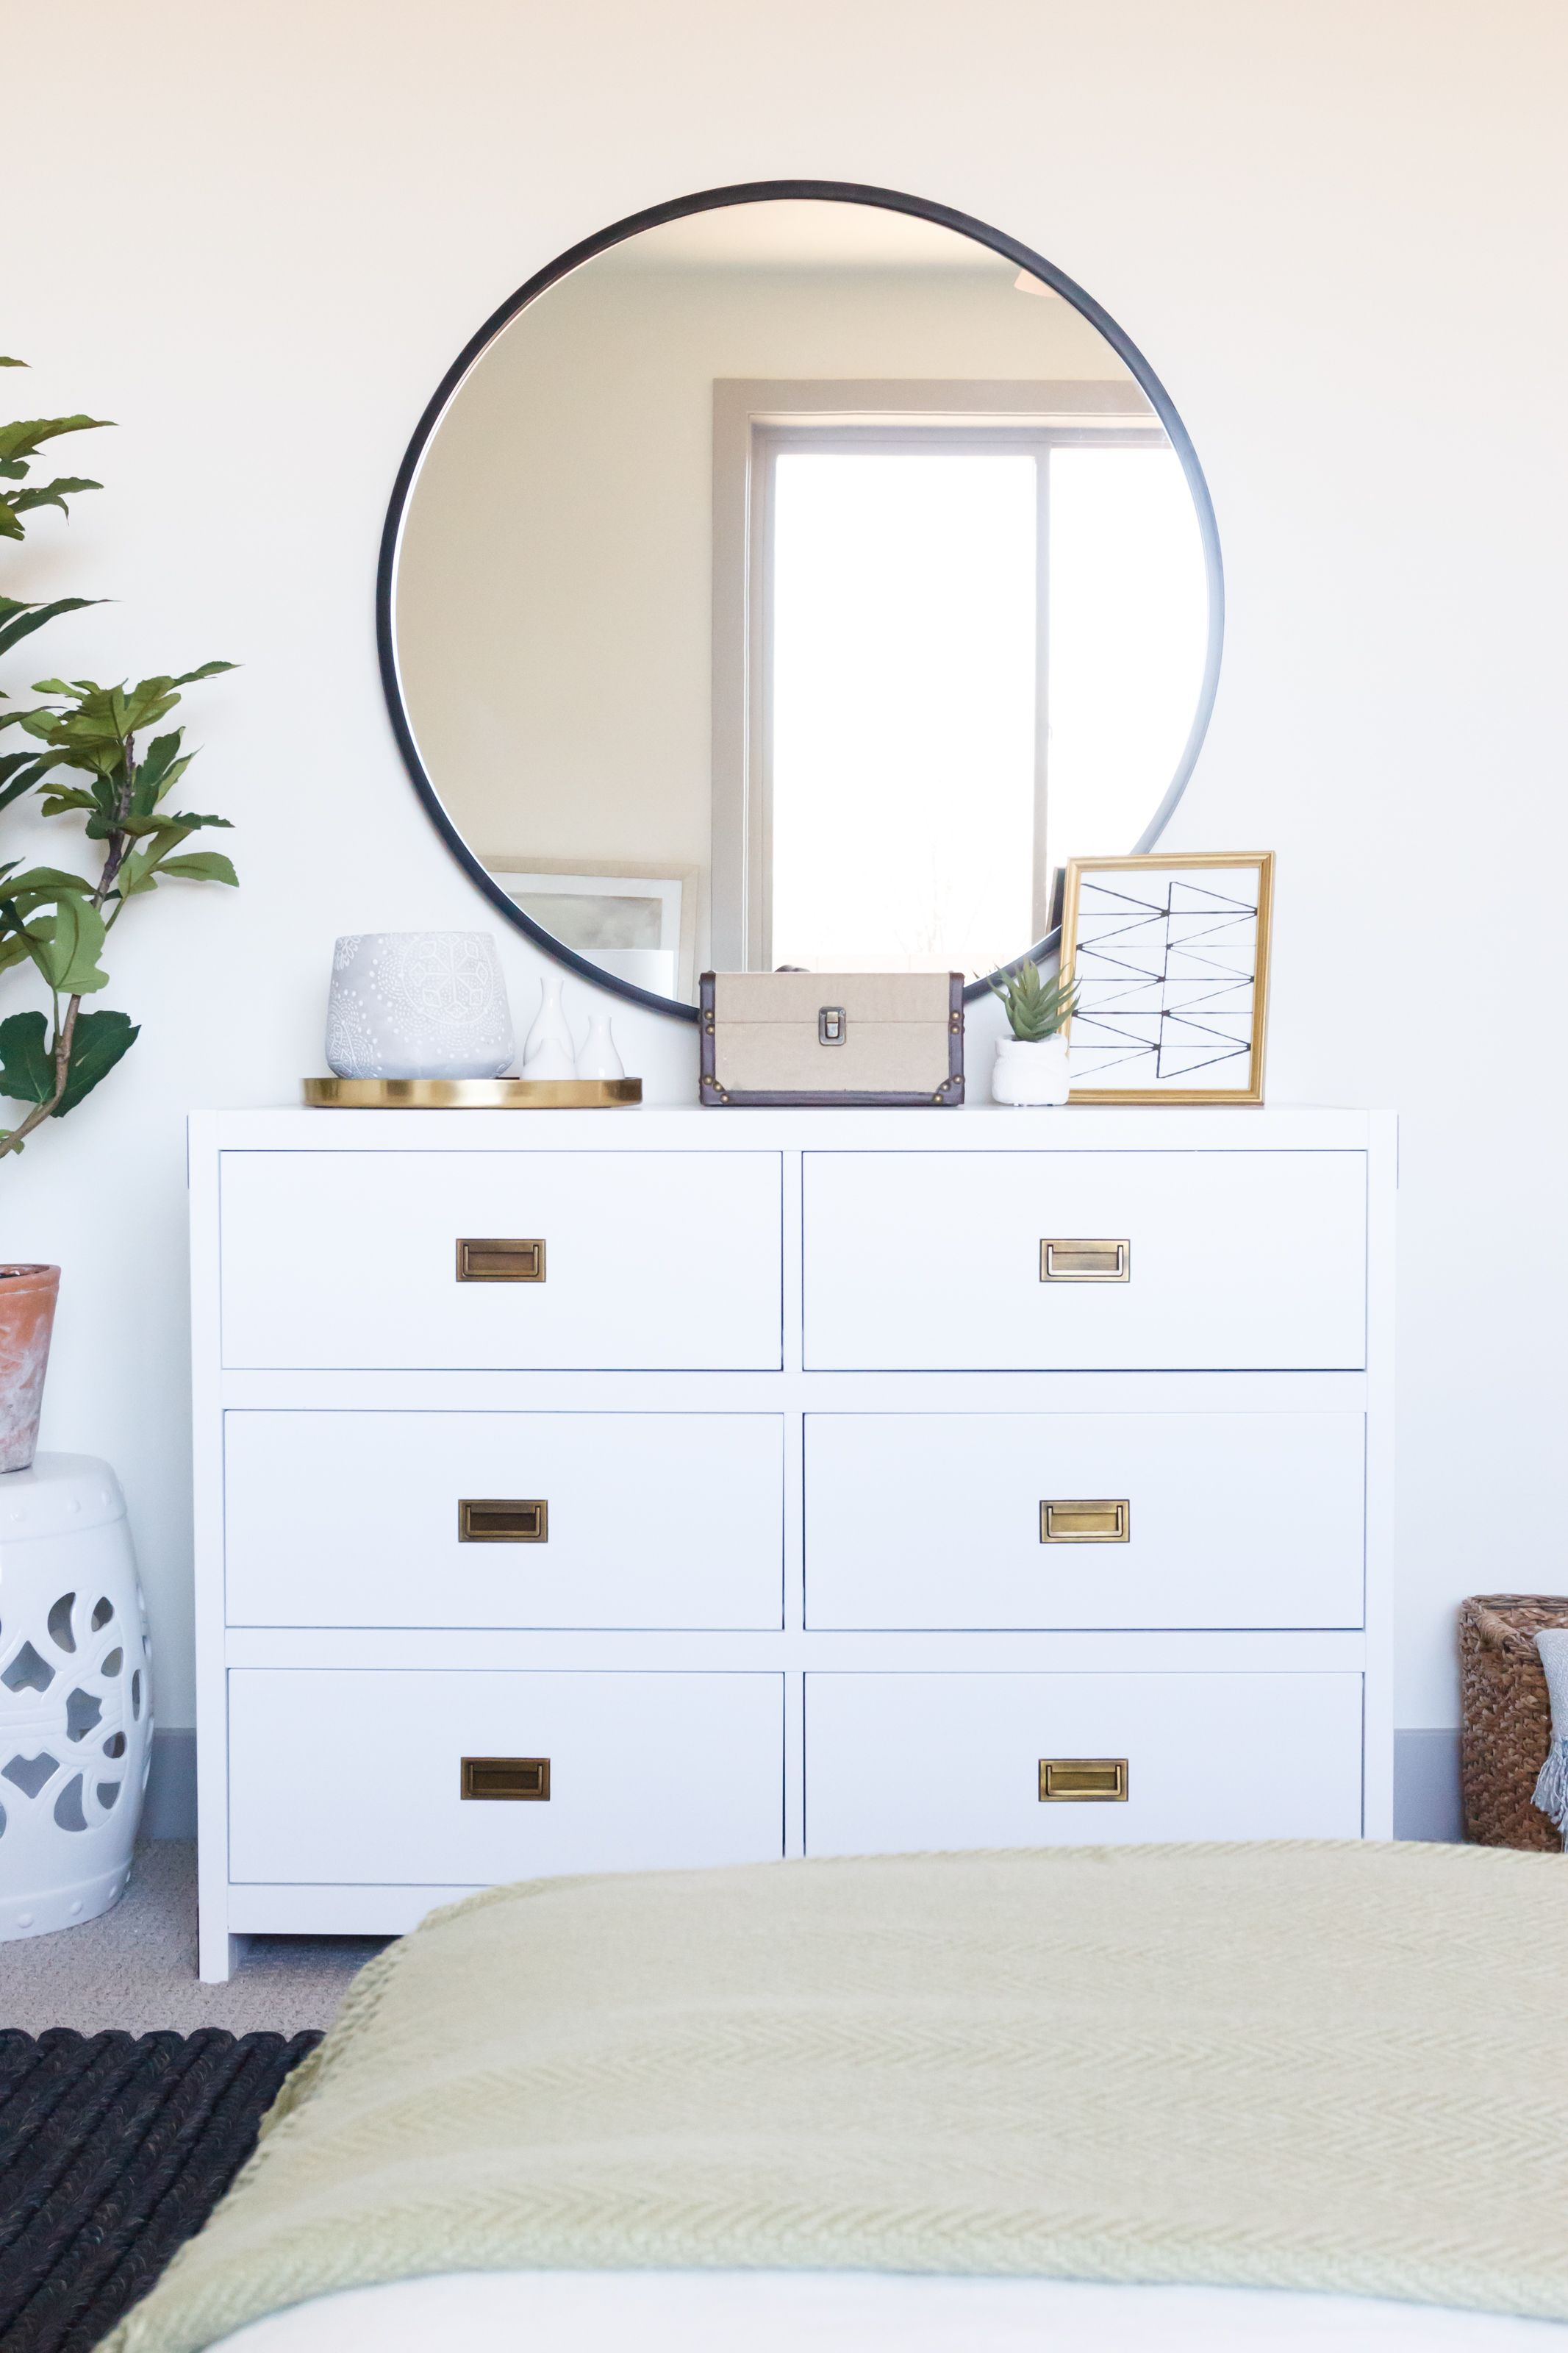 Interior Design Of Guest Room: Salt Box Collective Guest Bedroom